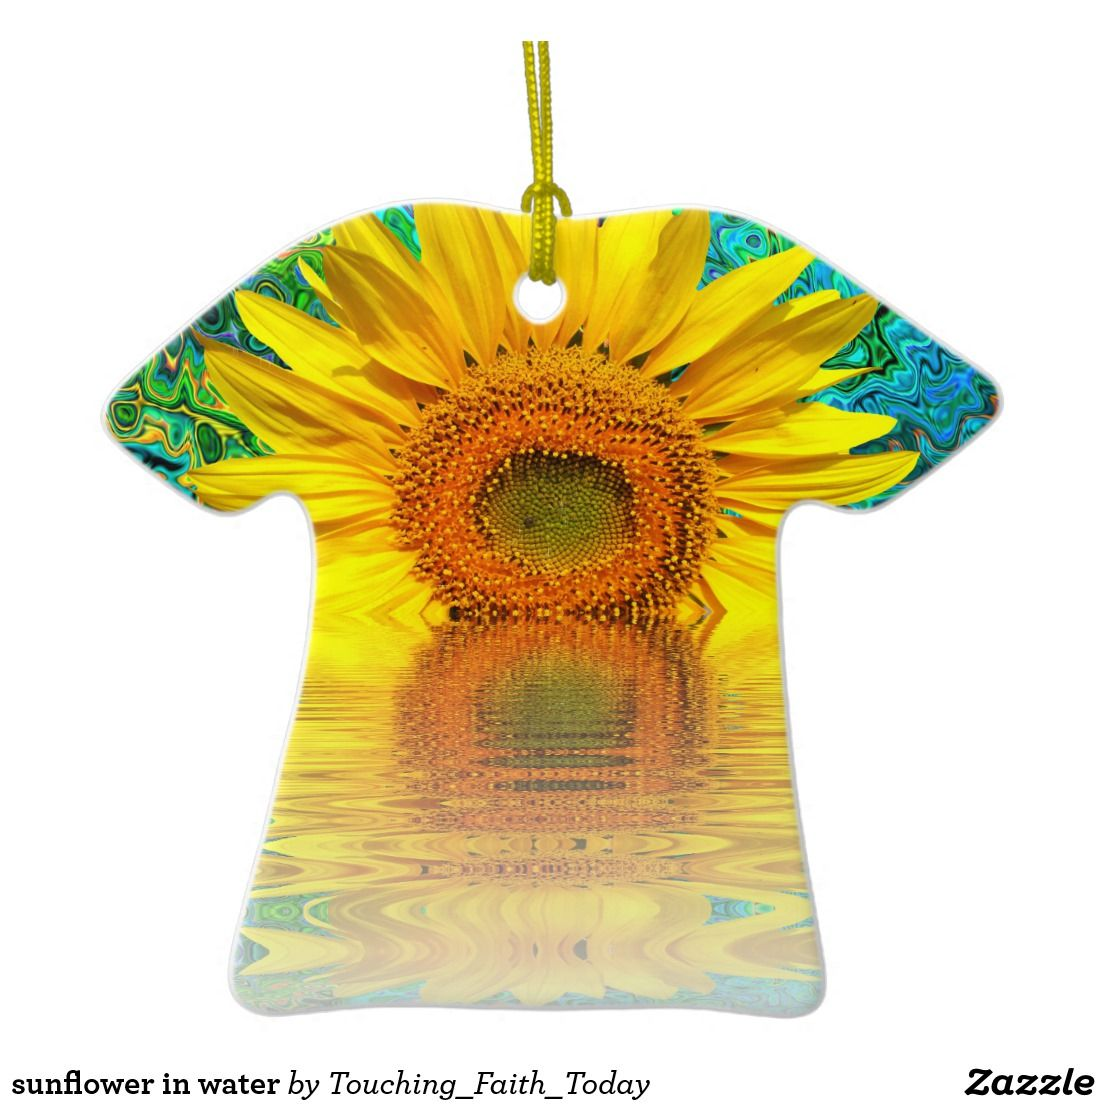 sunflower in water Keepsake ornaments, Holiday